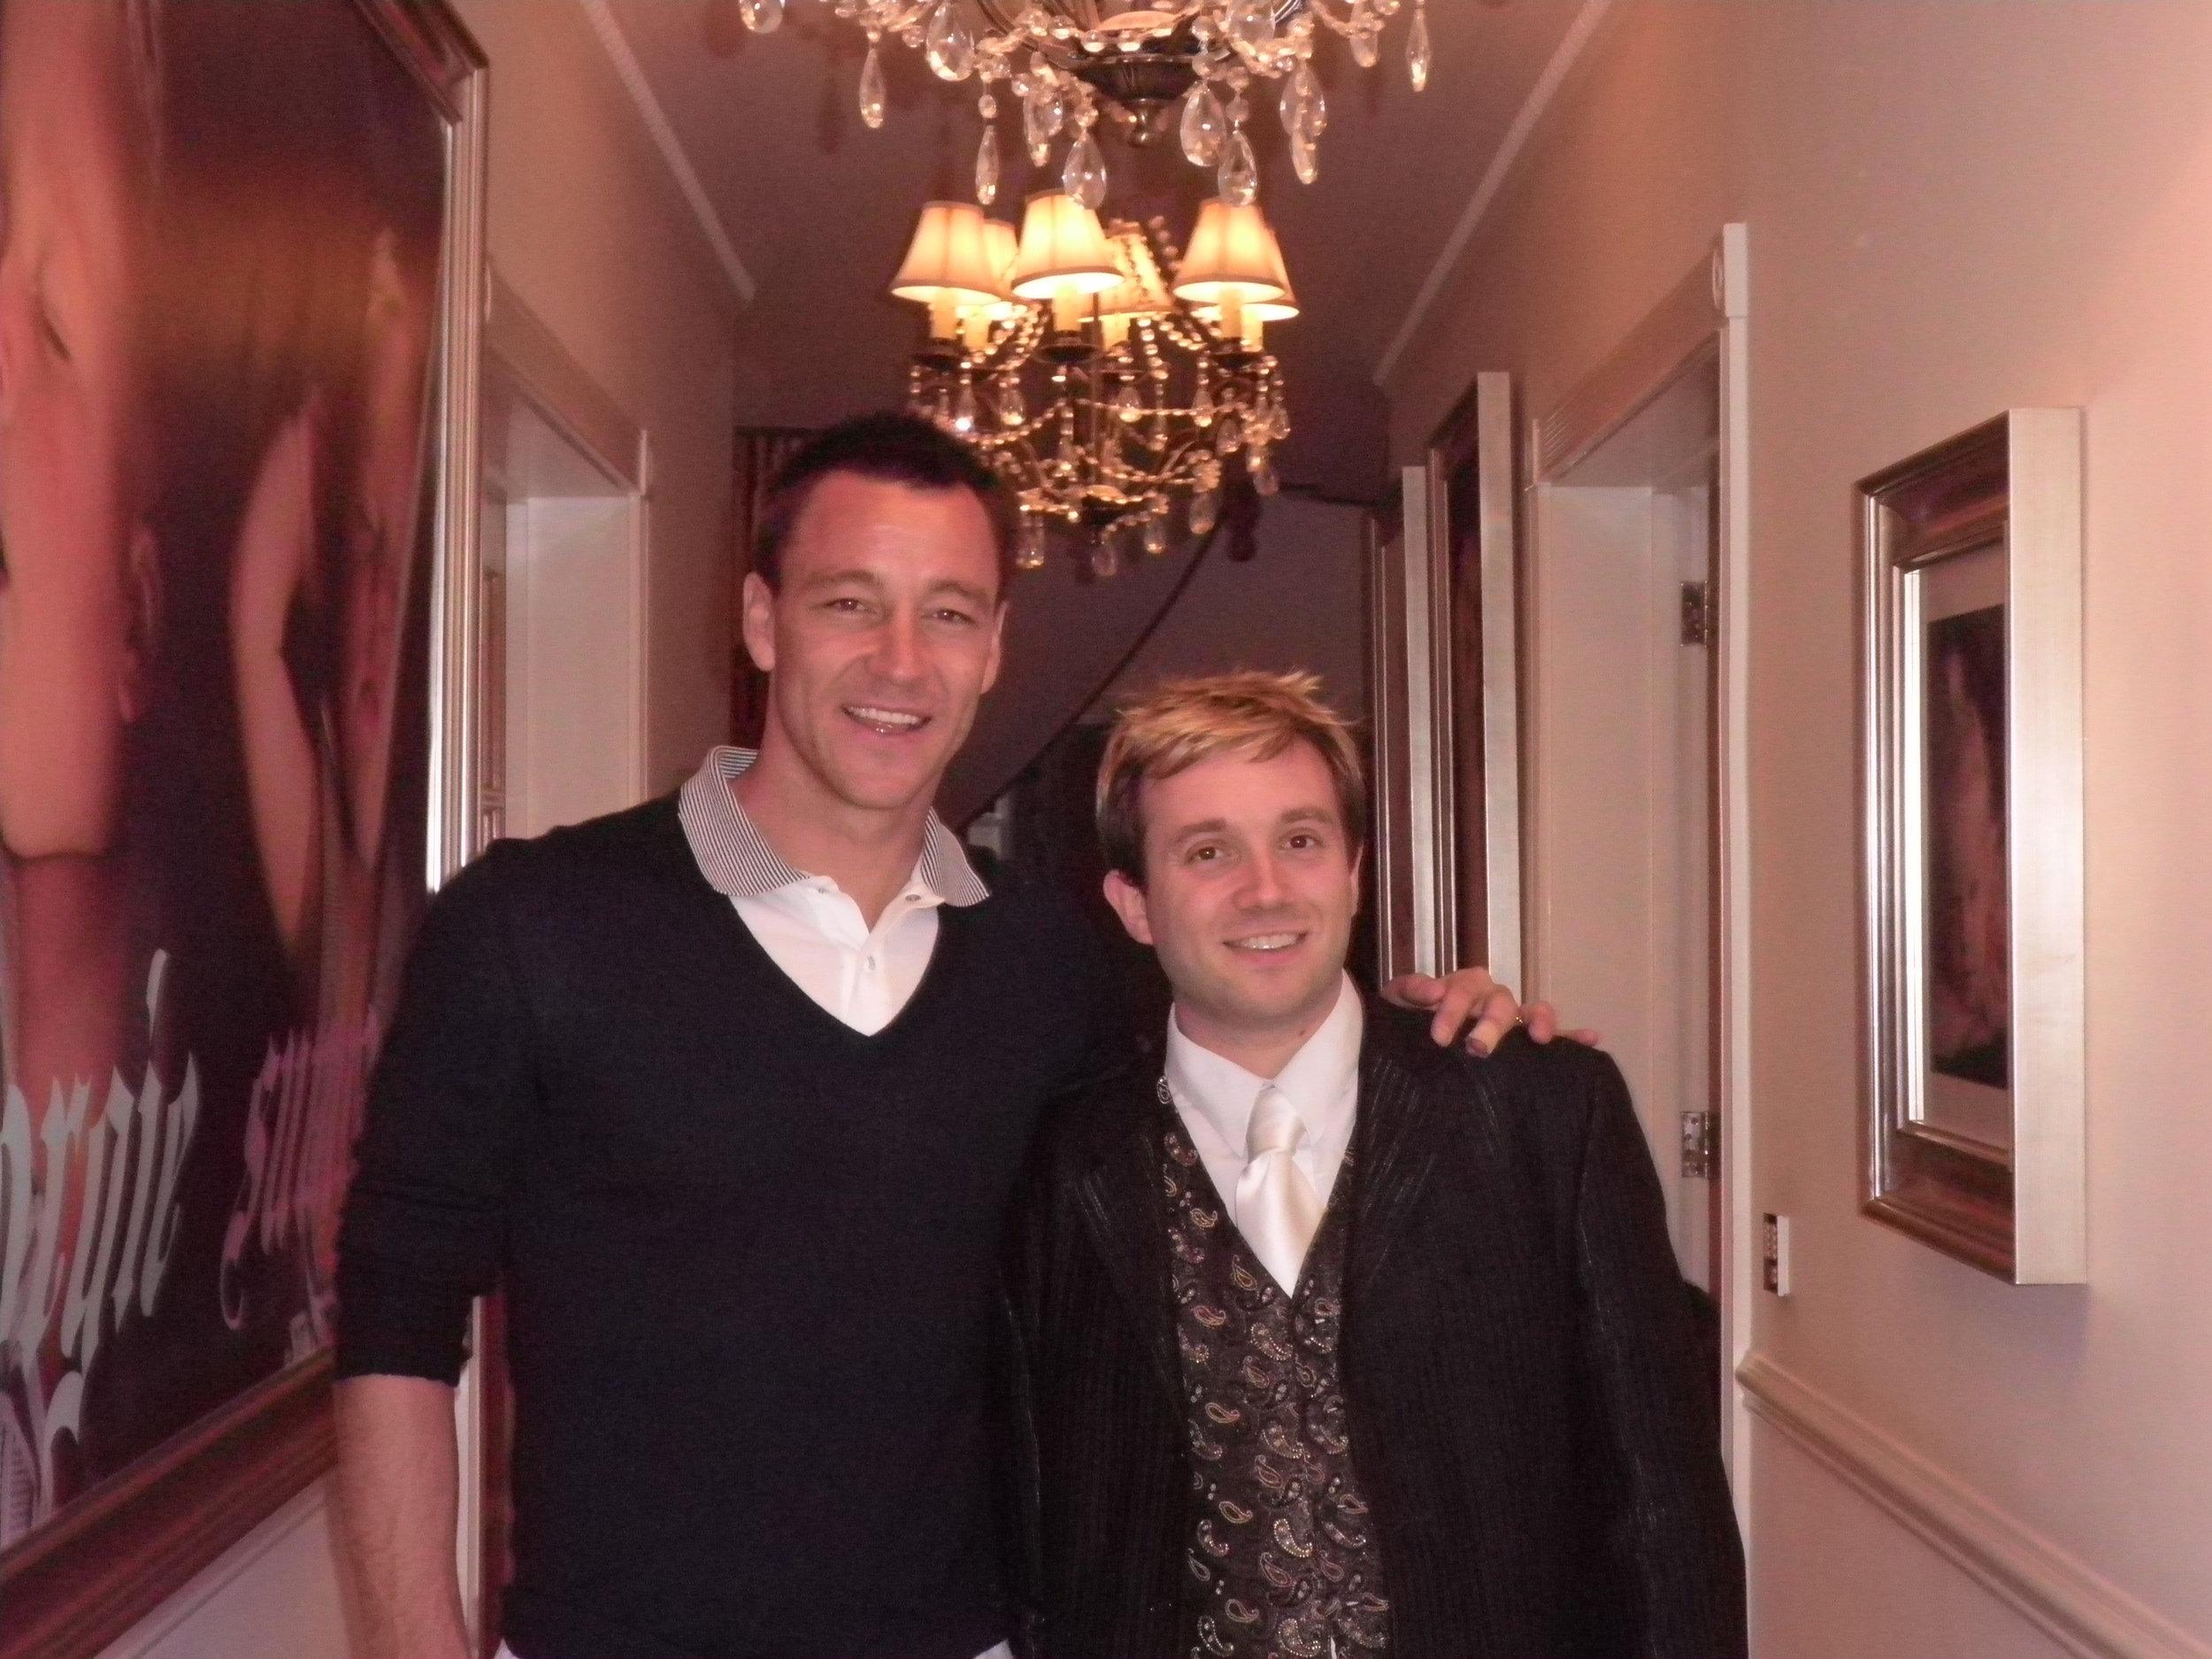 England Football Captain John Terry - Chelsea Magician